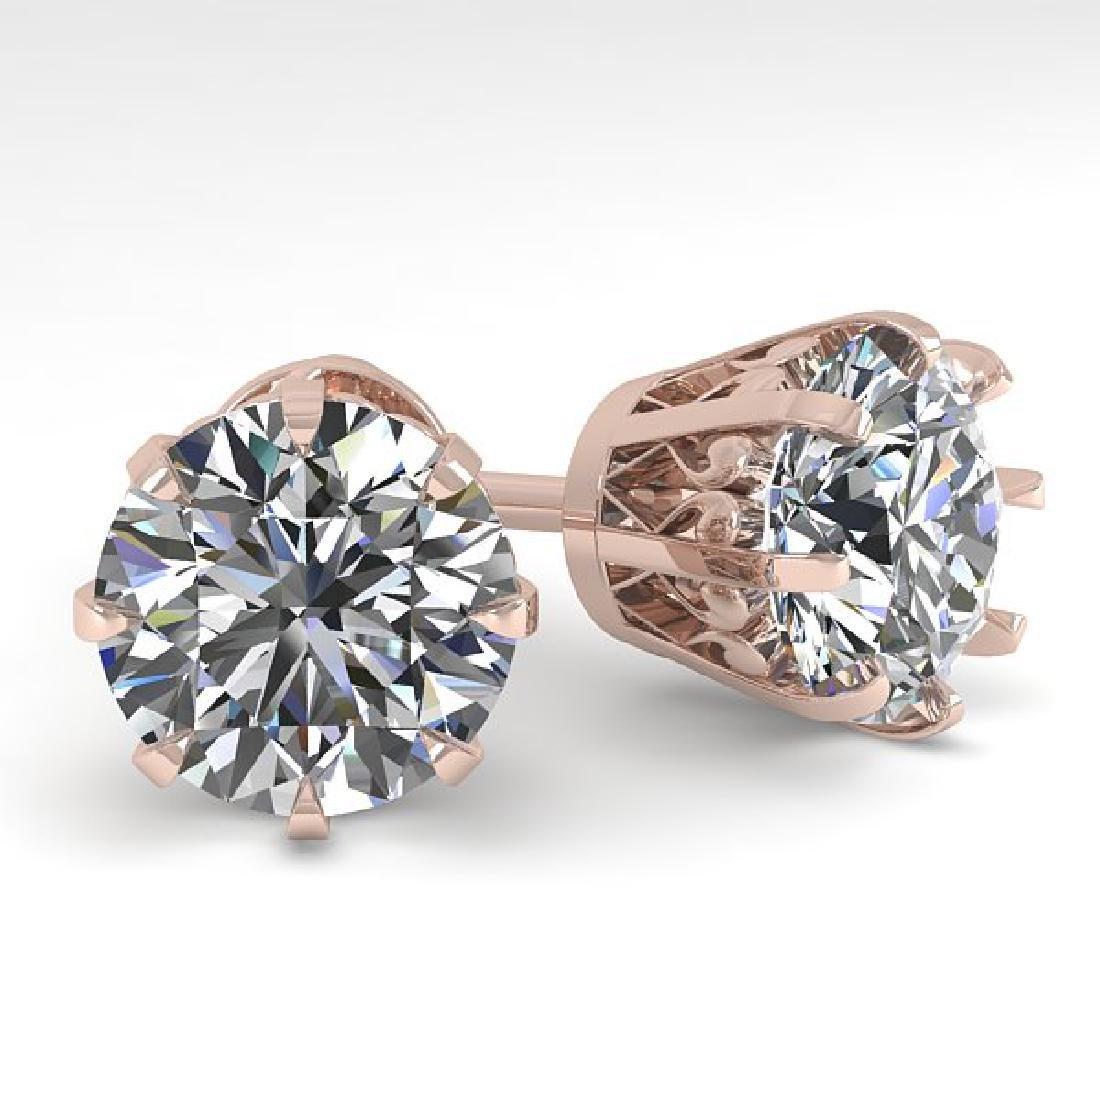 4 CTW VS/SI Diamond Stud Solitaire Earrings 18K Rose